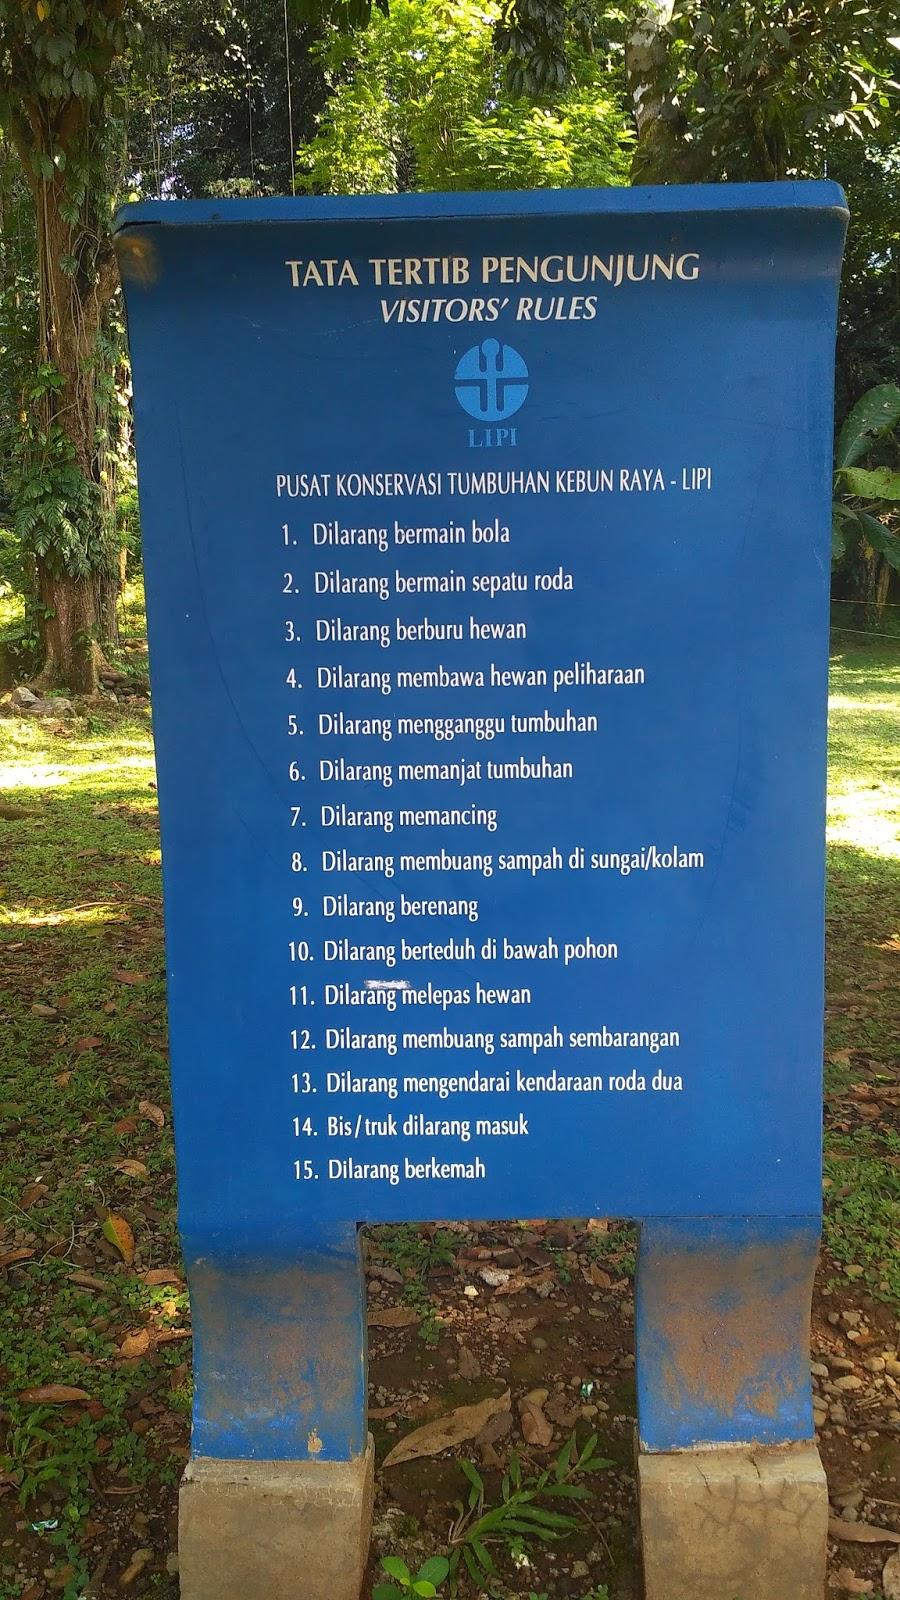 Wisata Kebun Raya Bogor (Tiket Masuk, Kuliner, Hotel, Misteri)